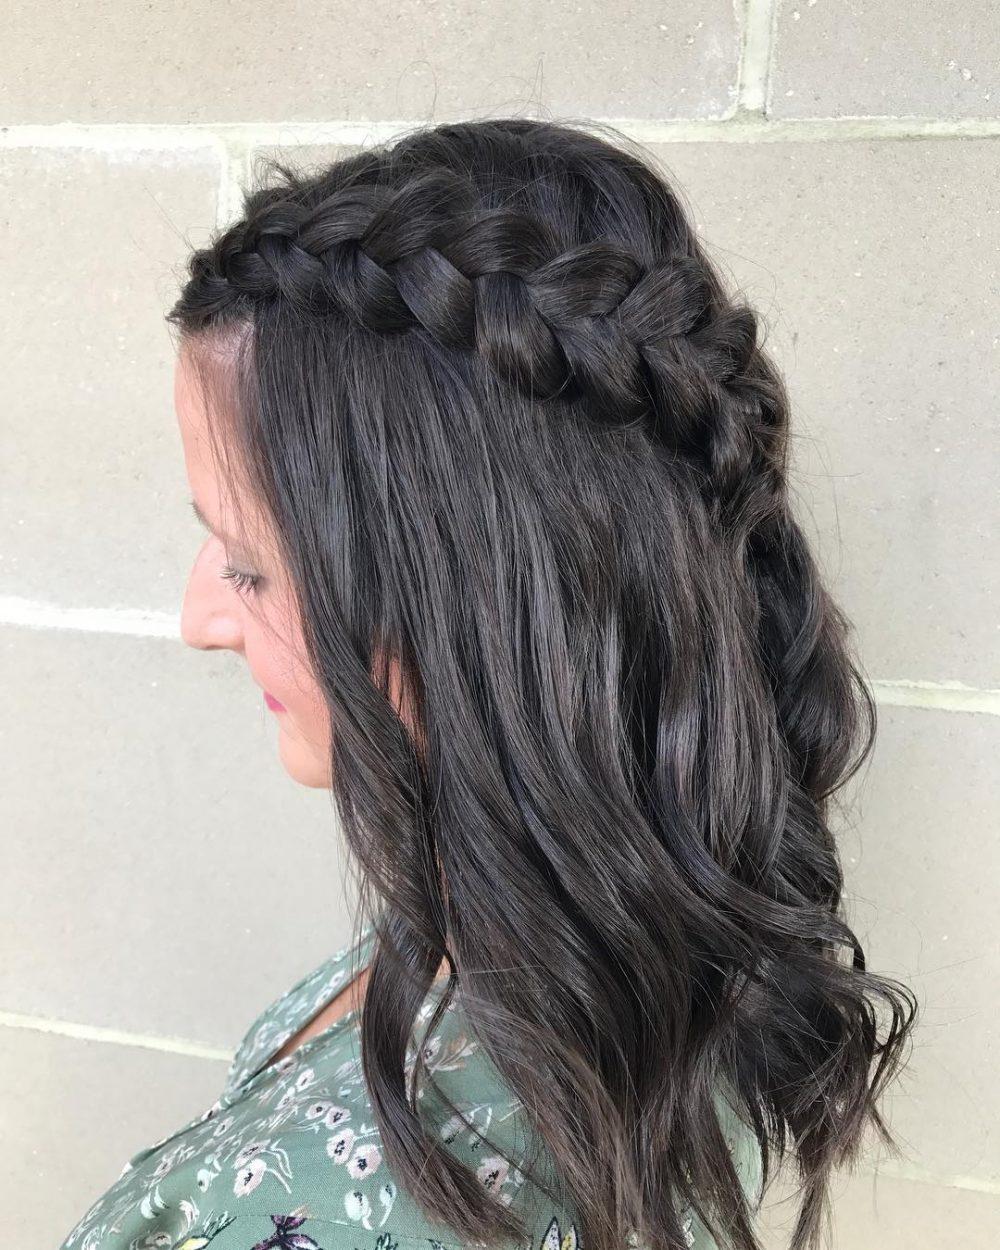 Dutch-Braid Cute Medium Length Hairstyles to Glam Up Your Look